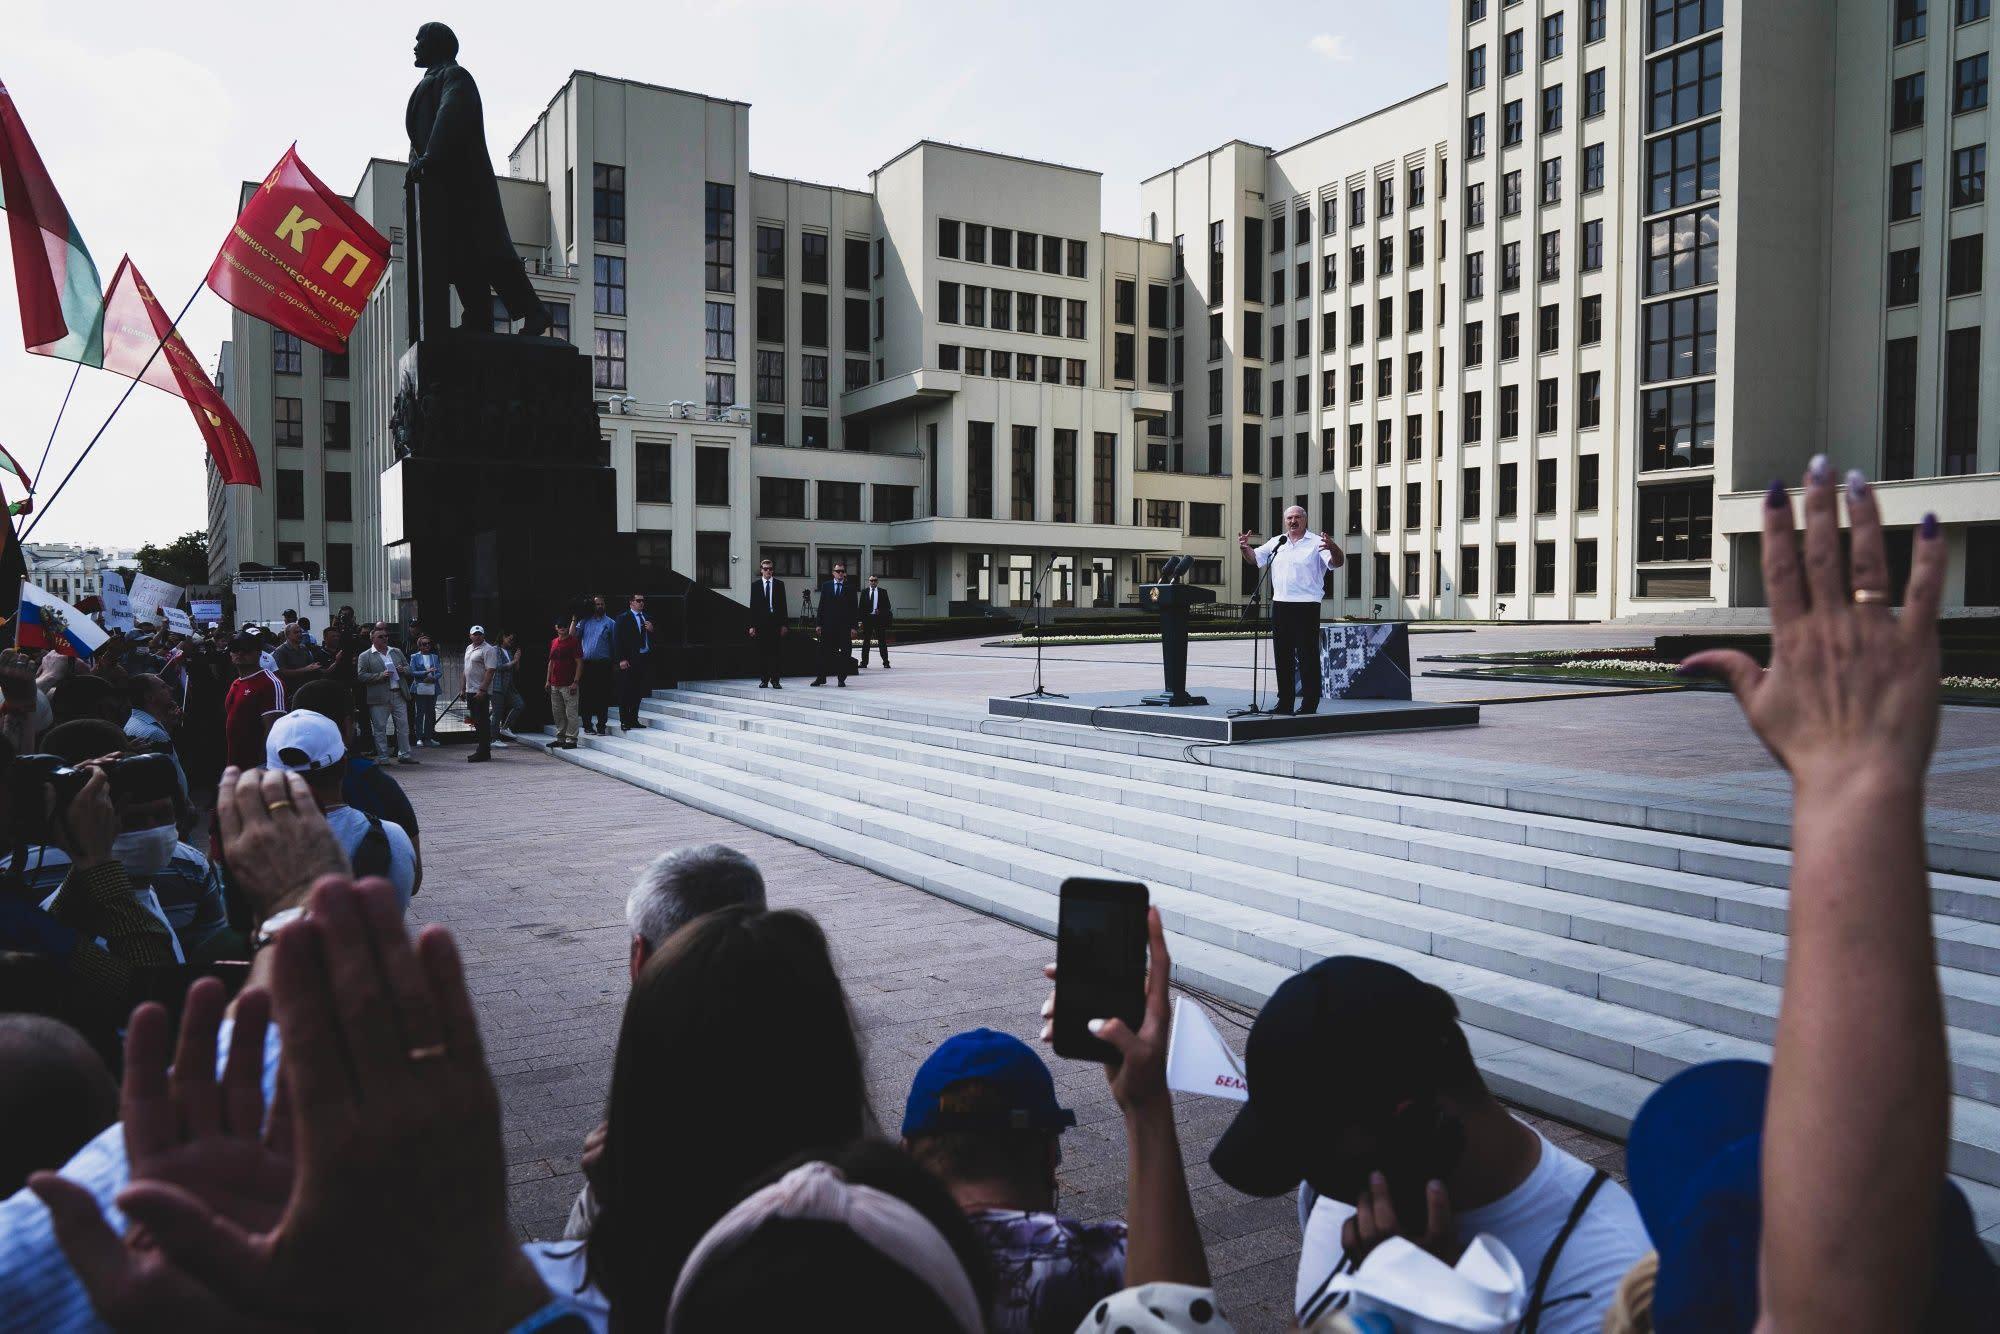 Belarusian Officials Shut Down Internet With Technology Made by U.S. Firm